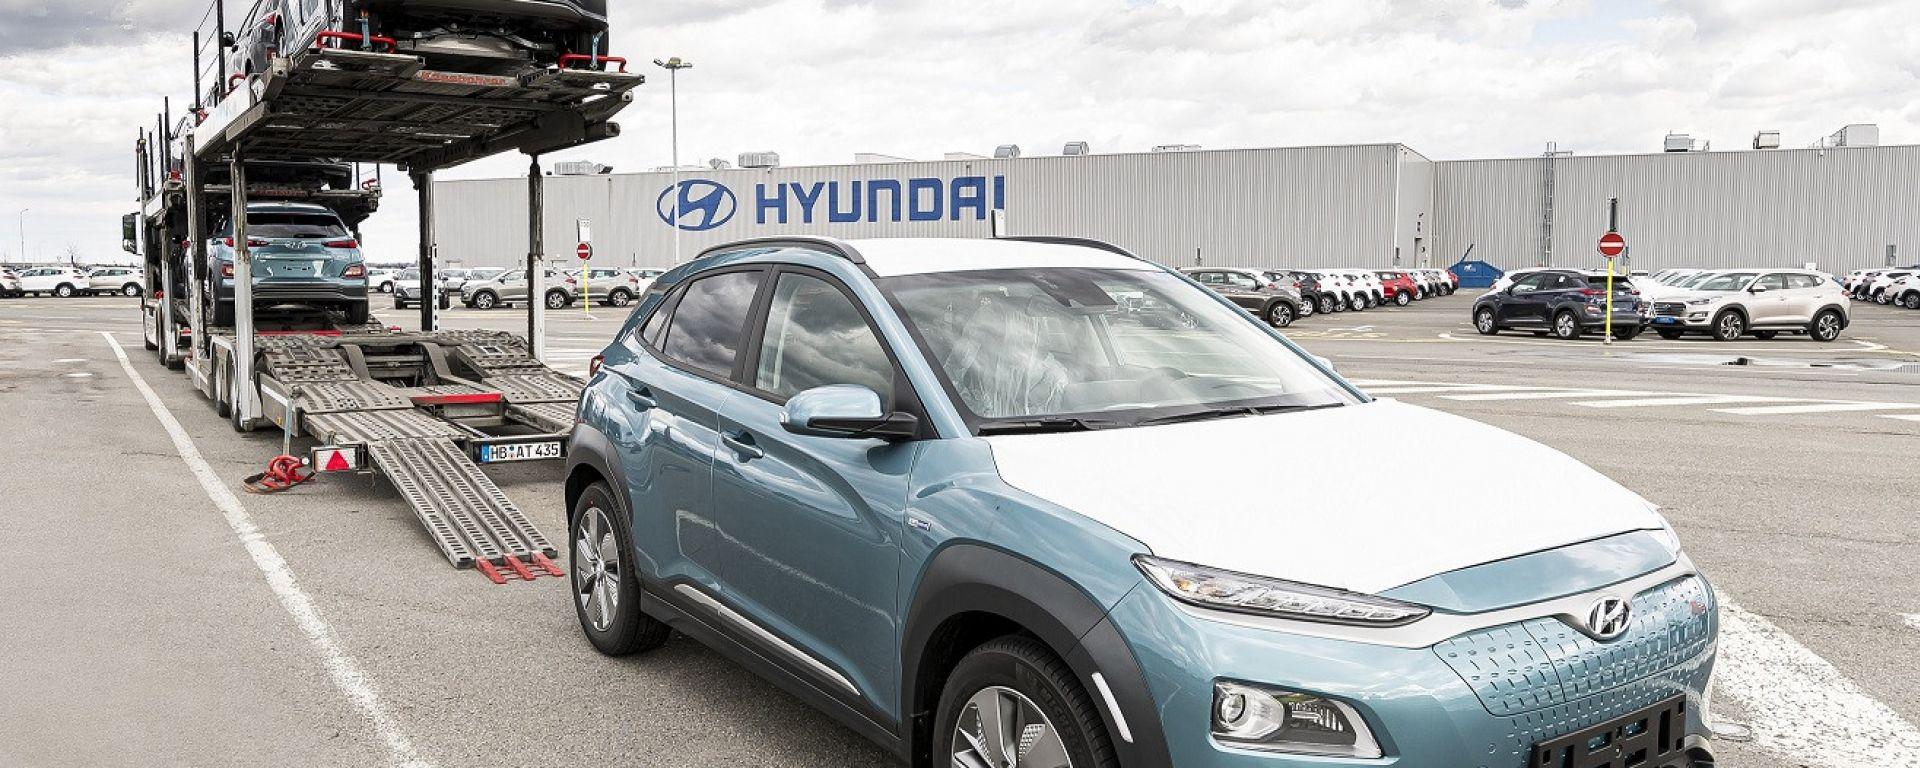 Hyundai Kona Electric: in consegna le prime unità nate in Europa